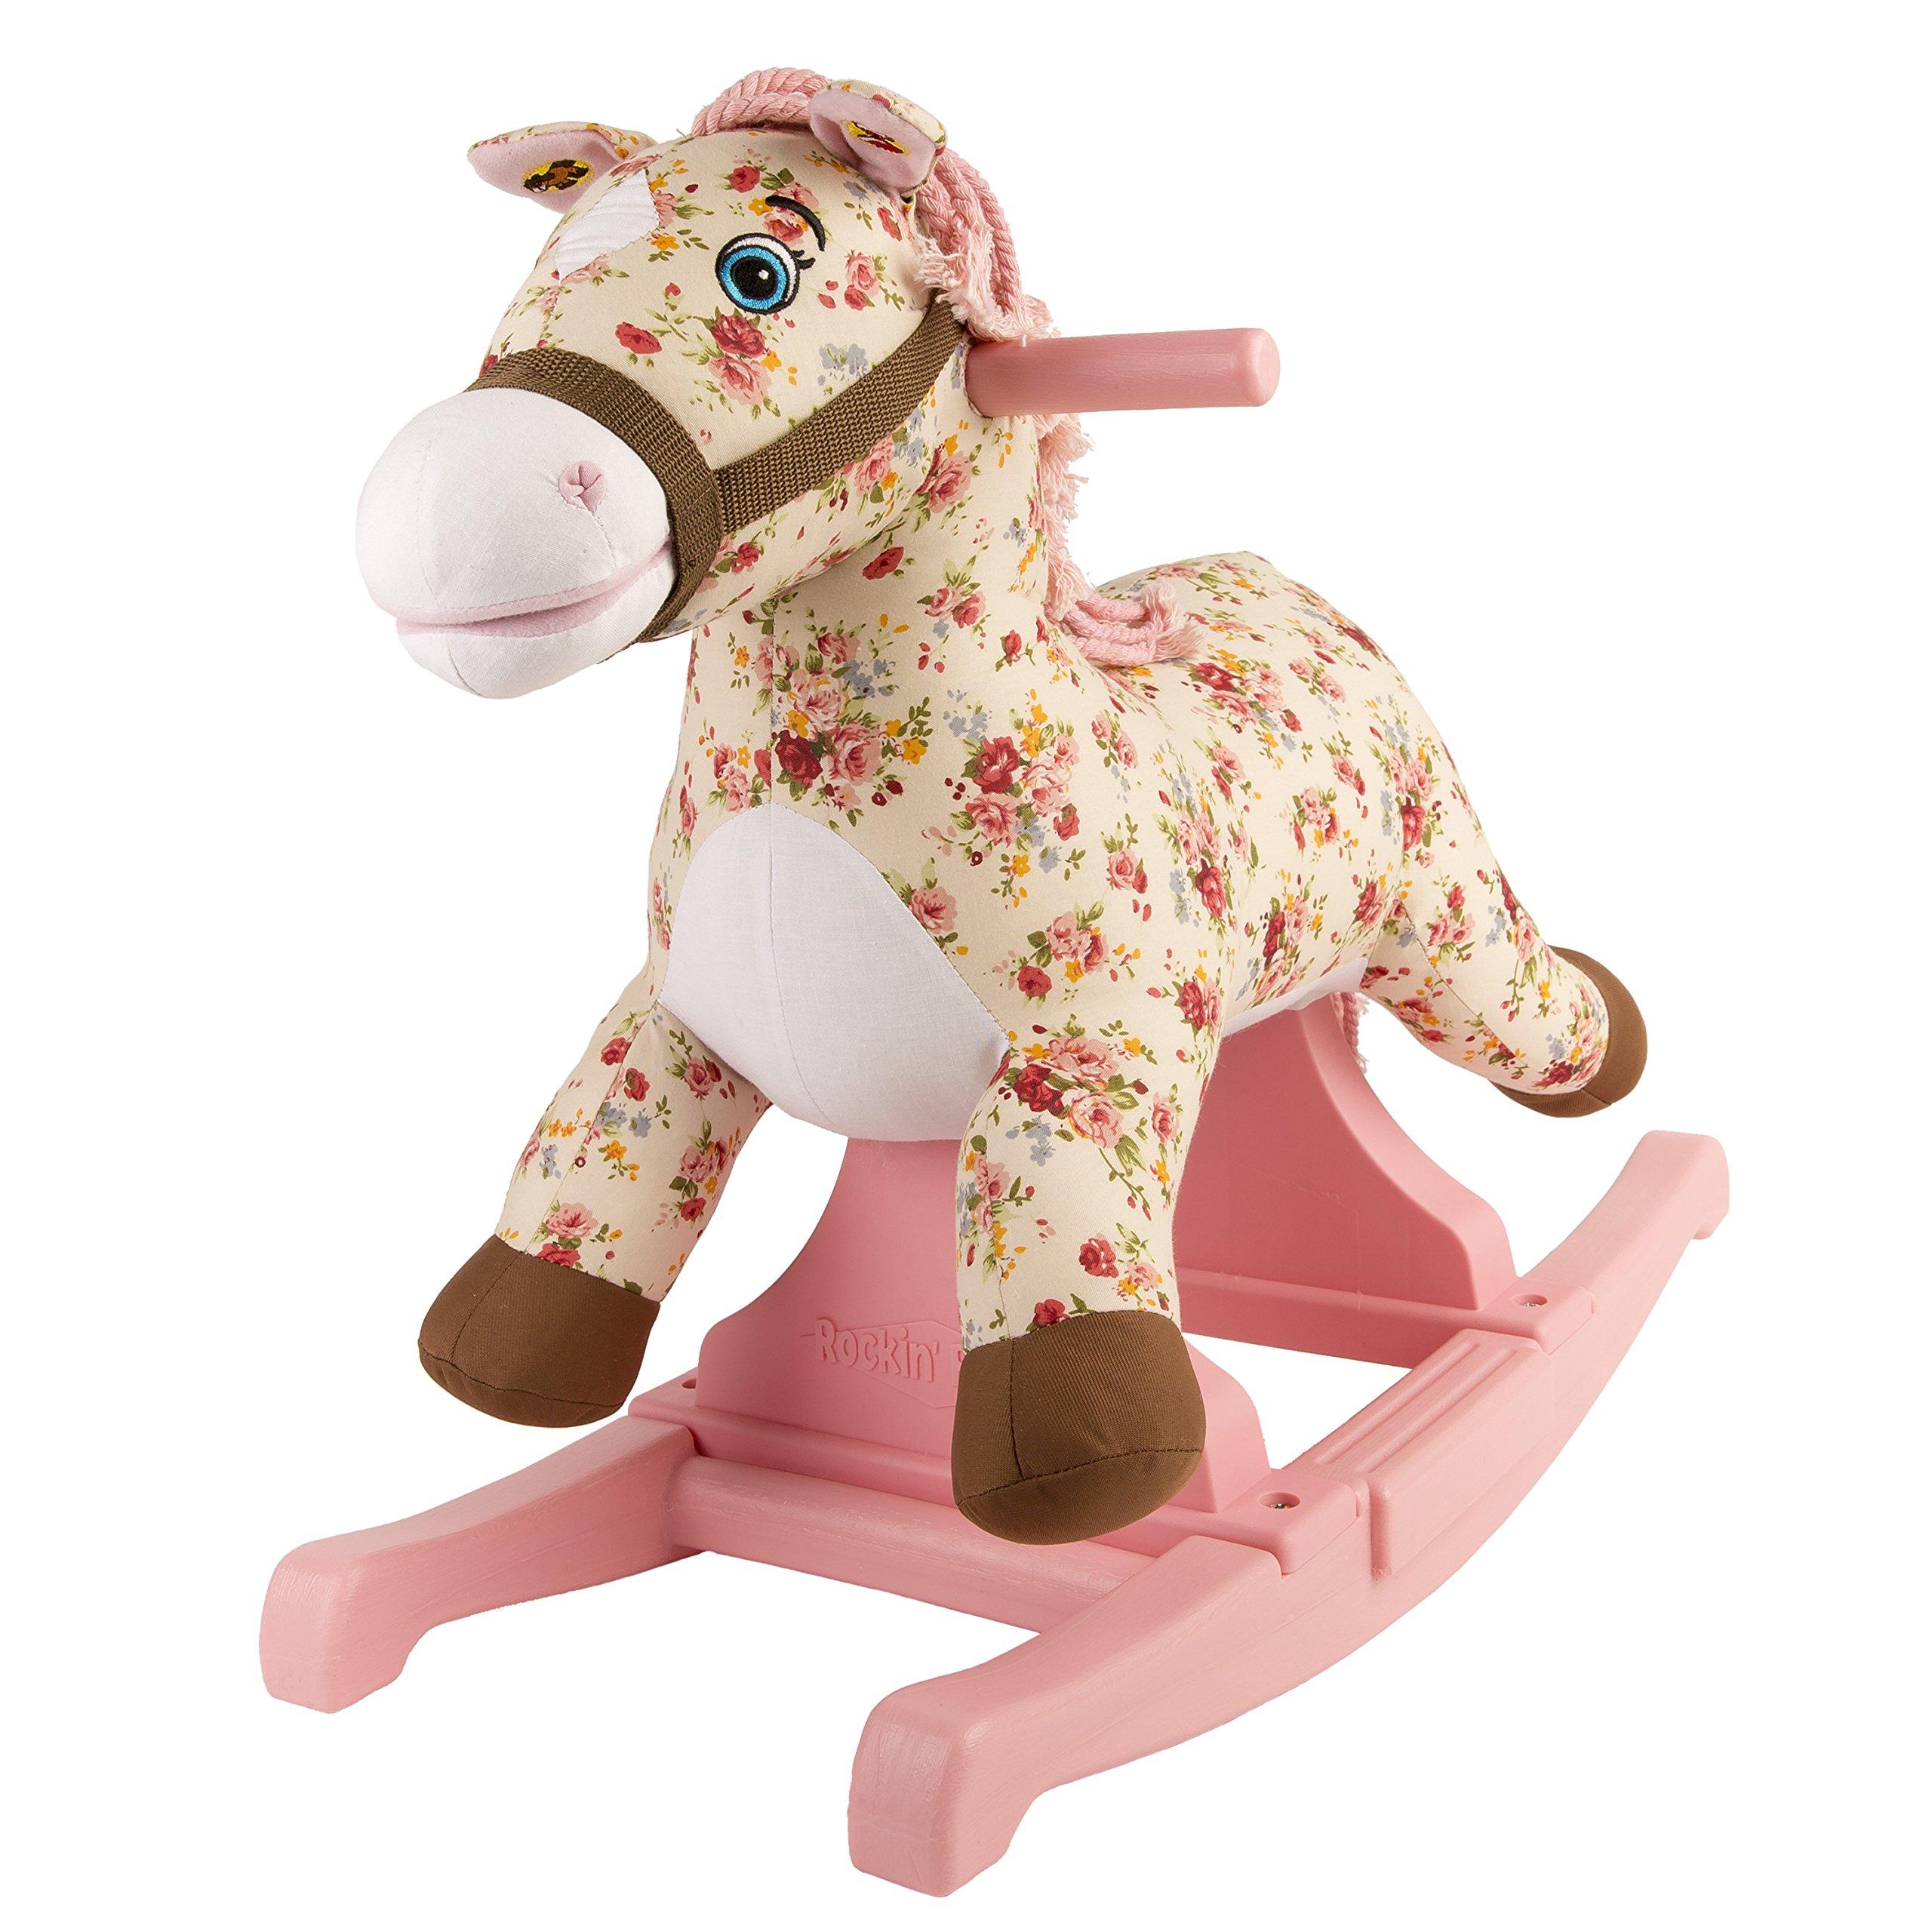 Rockin' Rider 5-20343M1 Bandana Vintage Rocking Pony Ride On